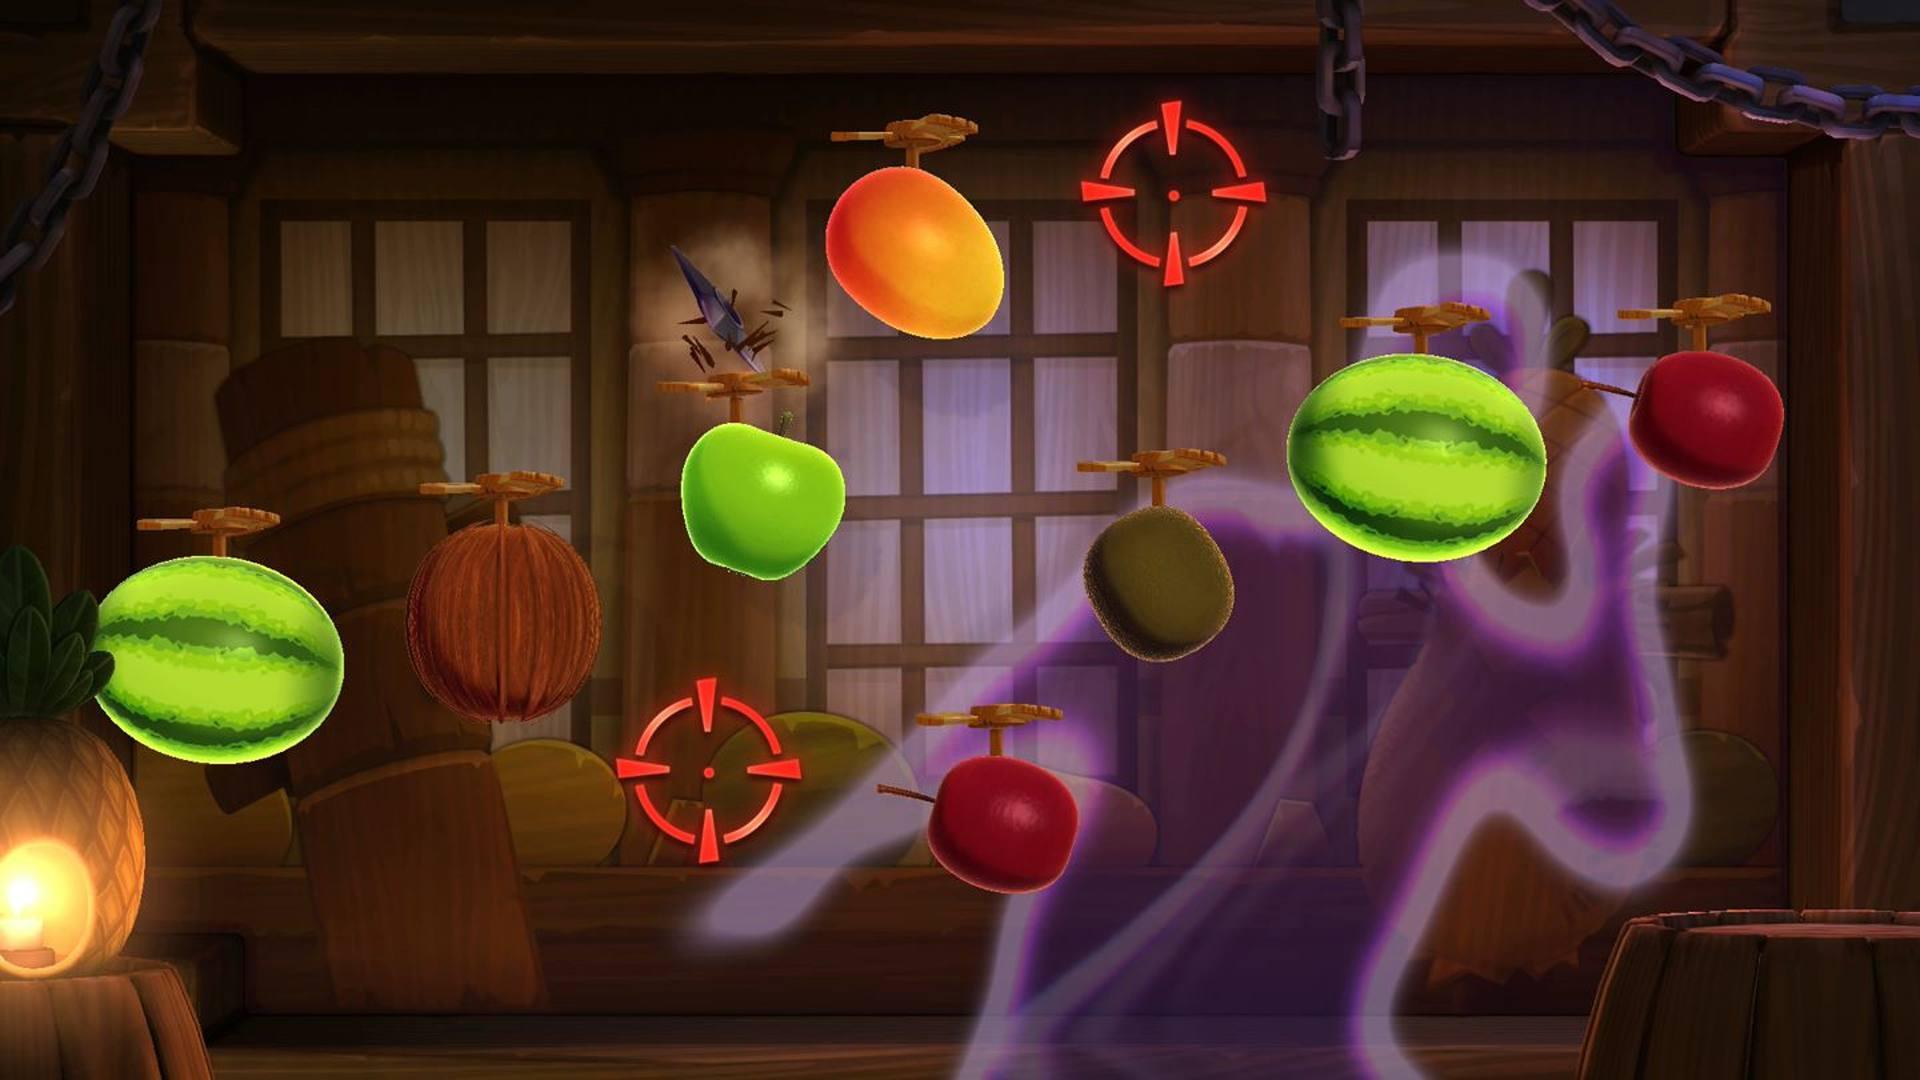 Fruit Ninja Kinect 2 offline video game for kids.